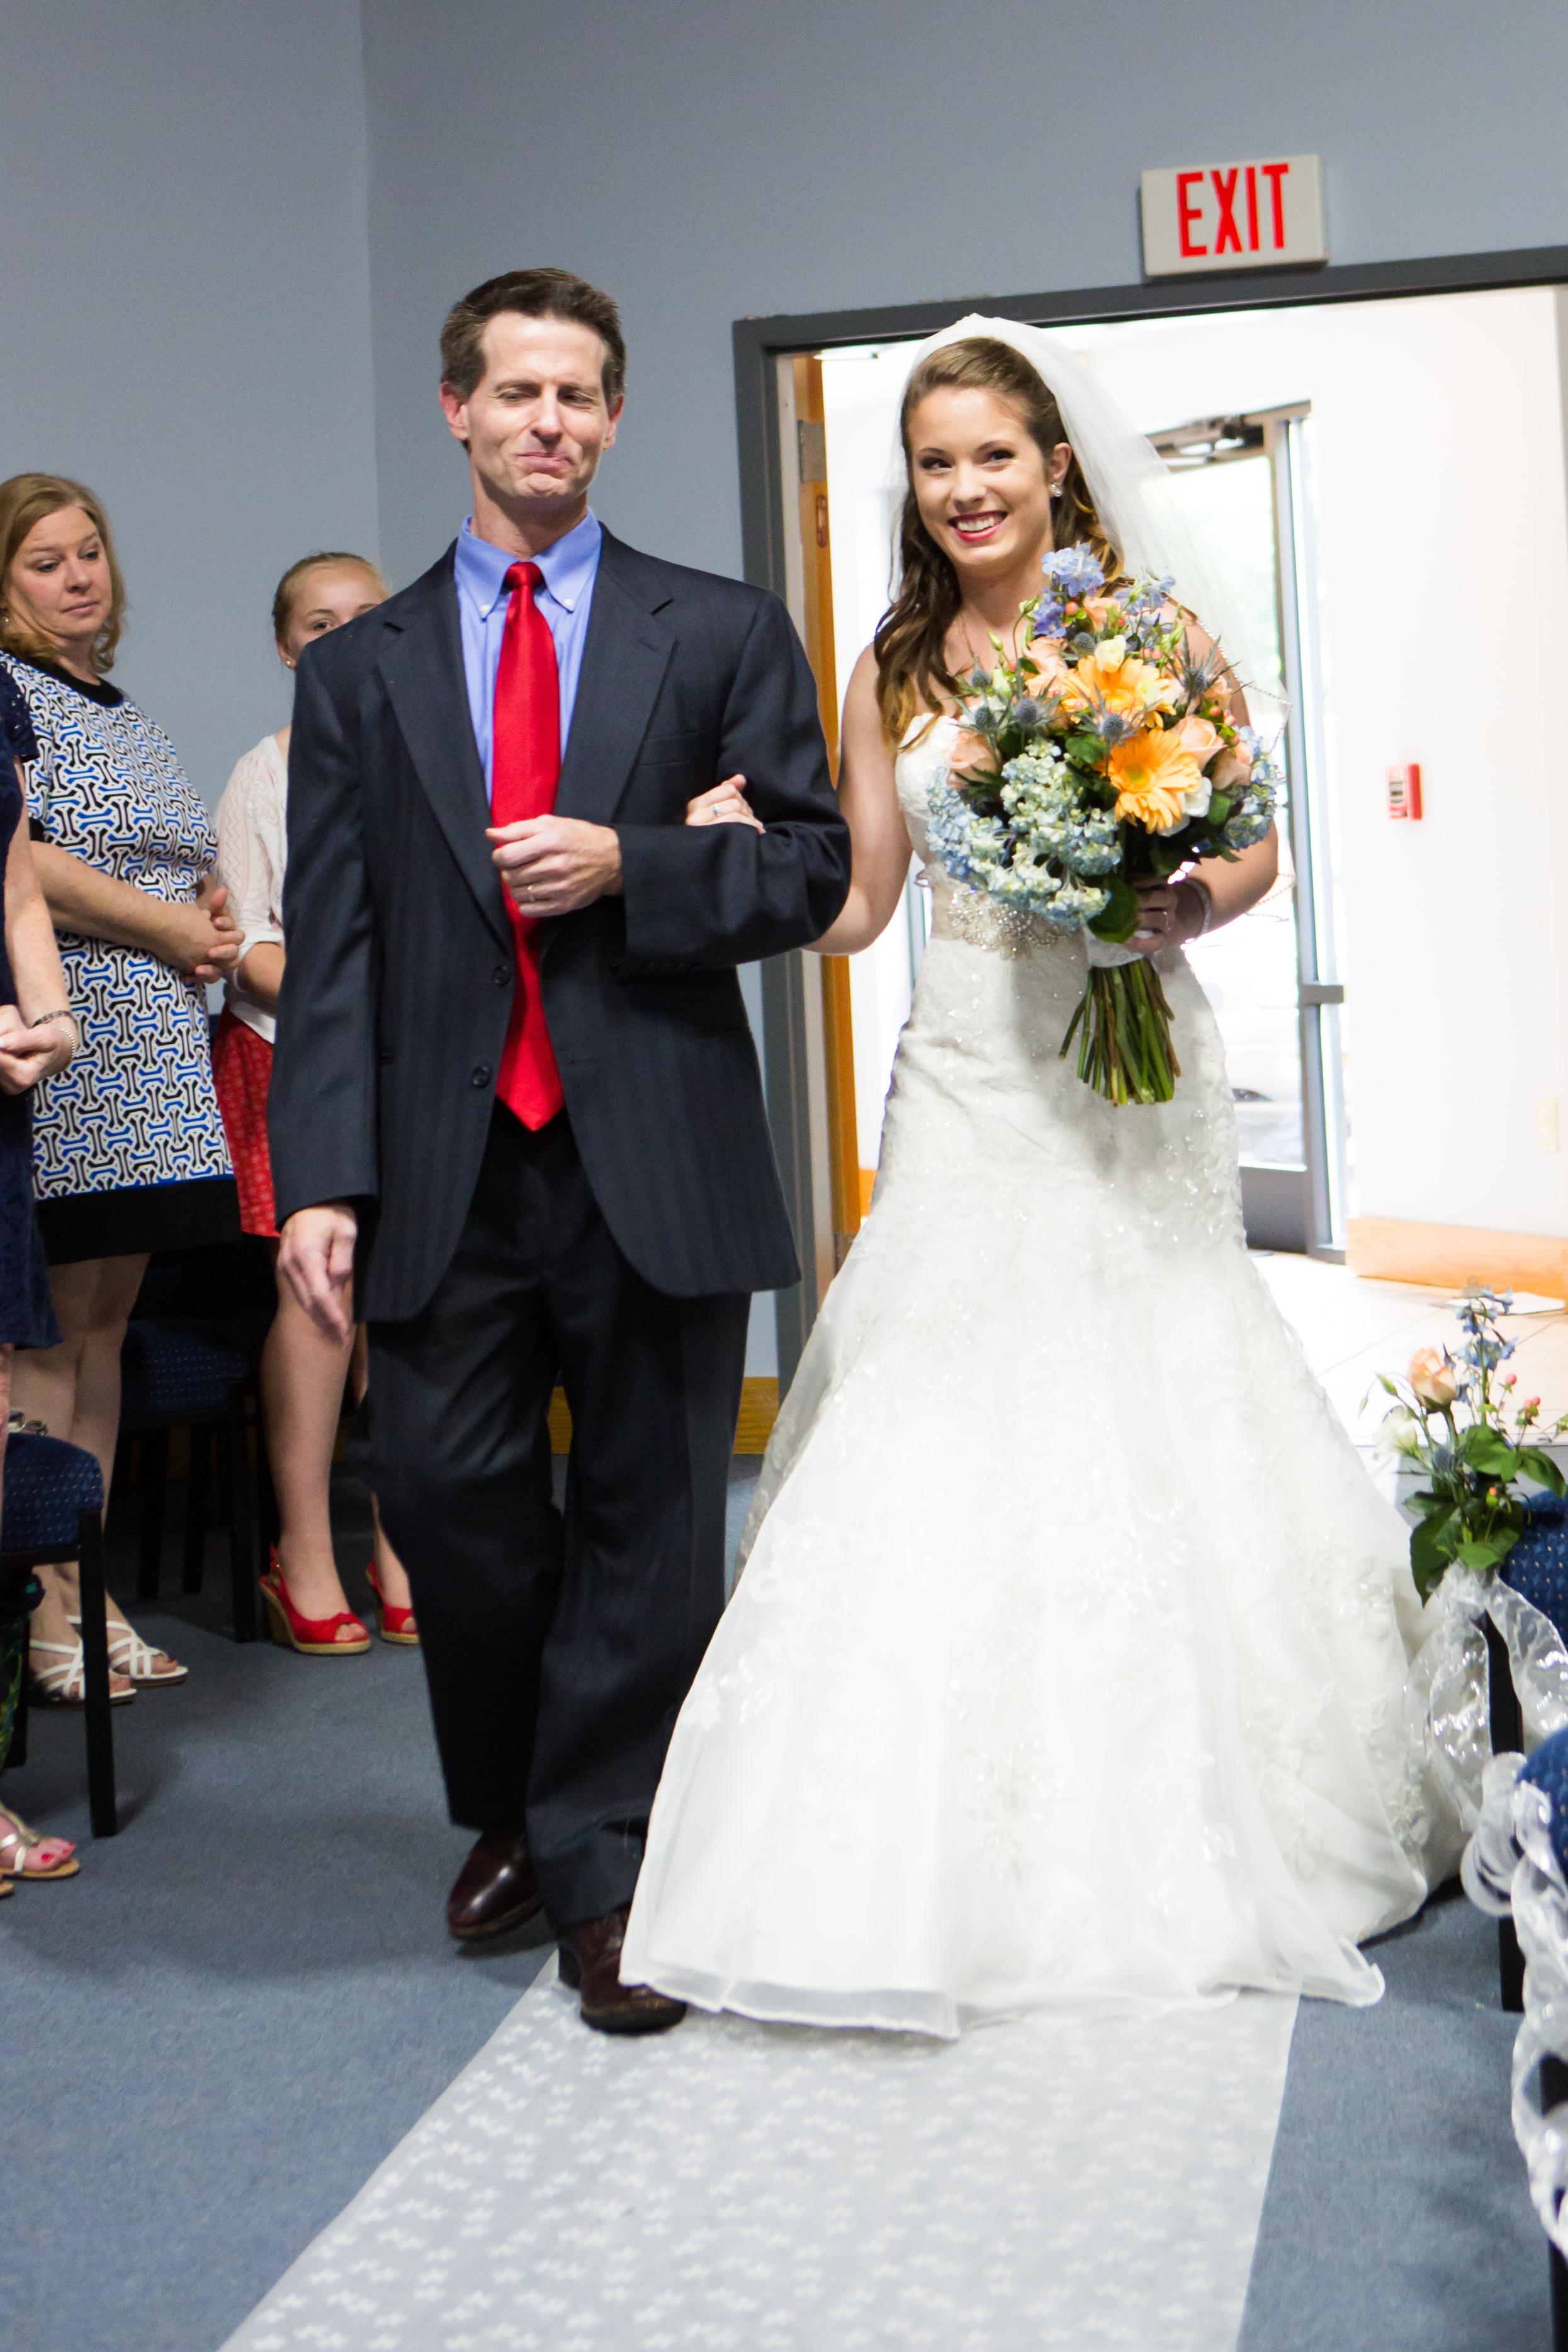 060416_Norris_Smith_Wedding_CF_11934.jpg